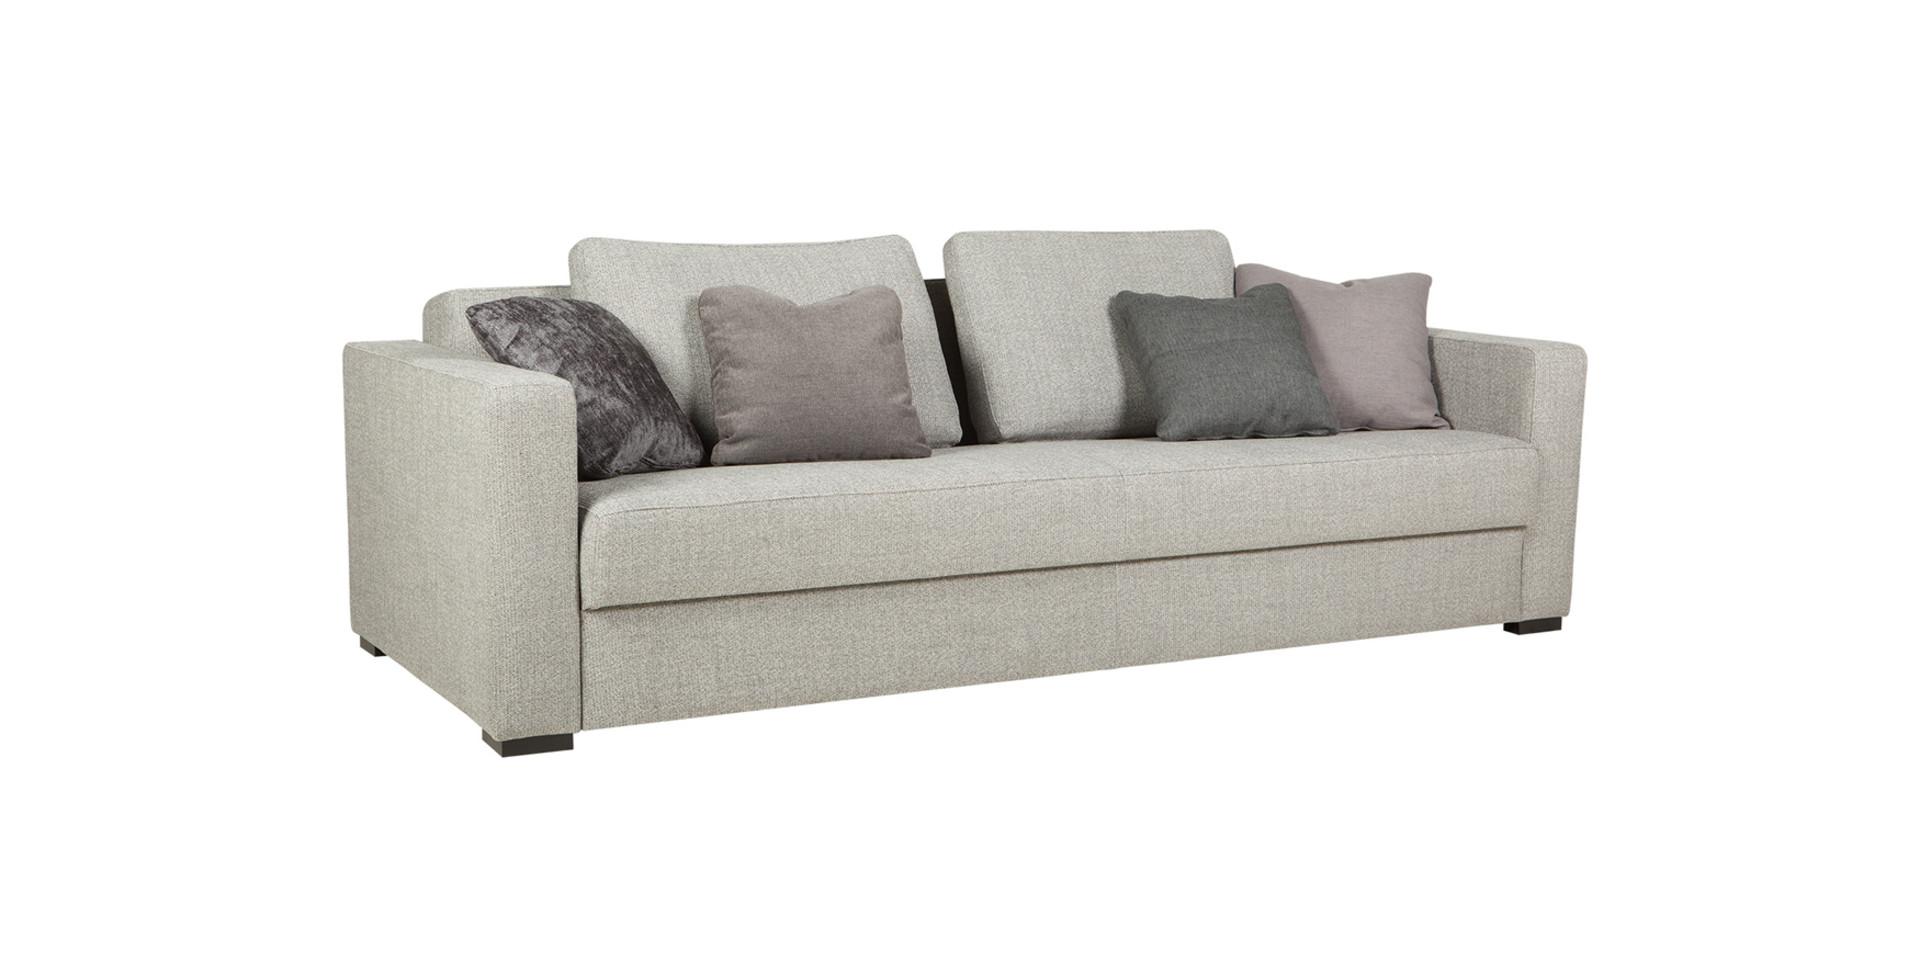 sits-puk-canape-convertible-sofa_bed_origin51_light_grey_5